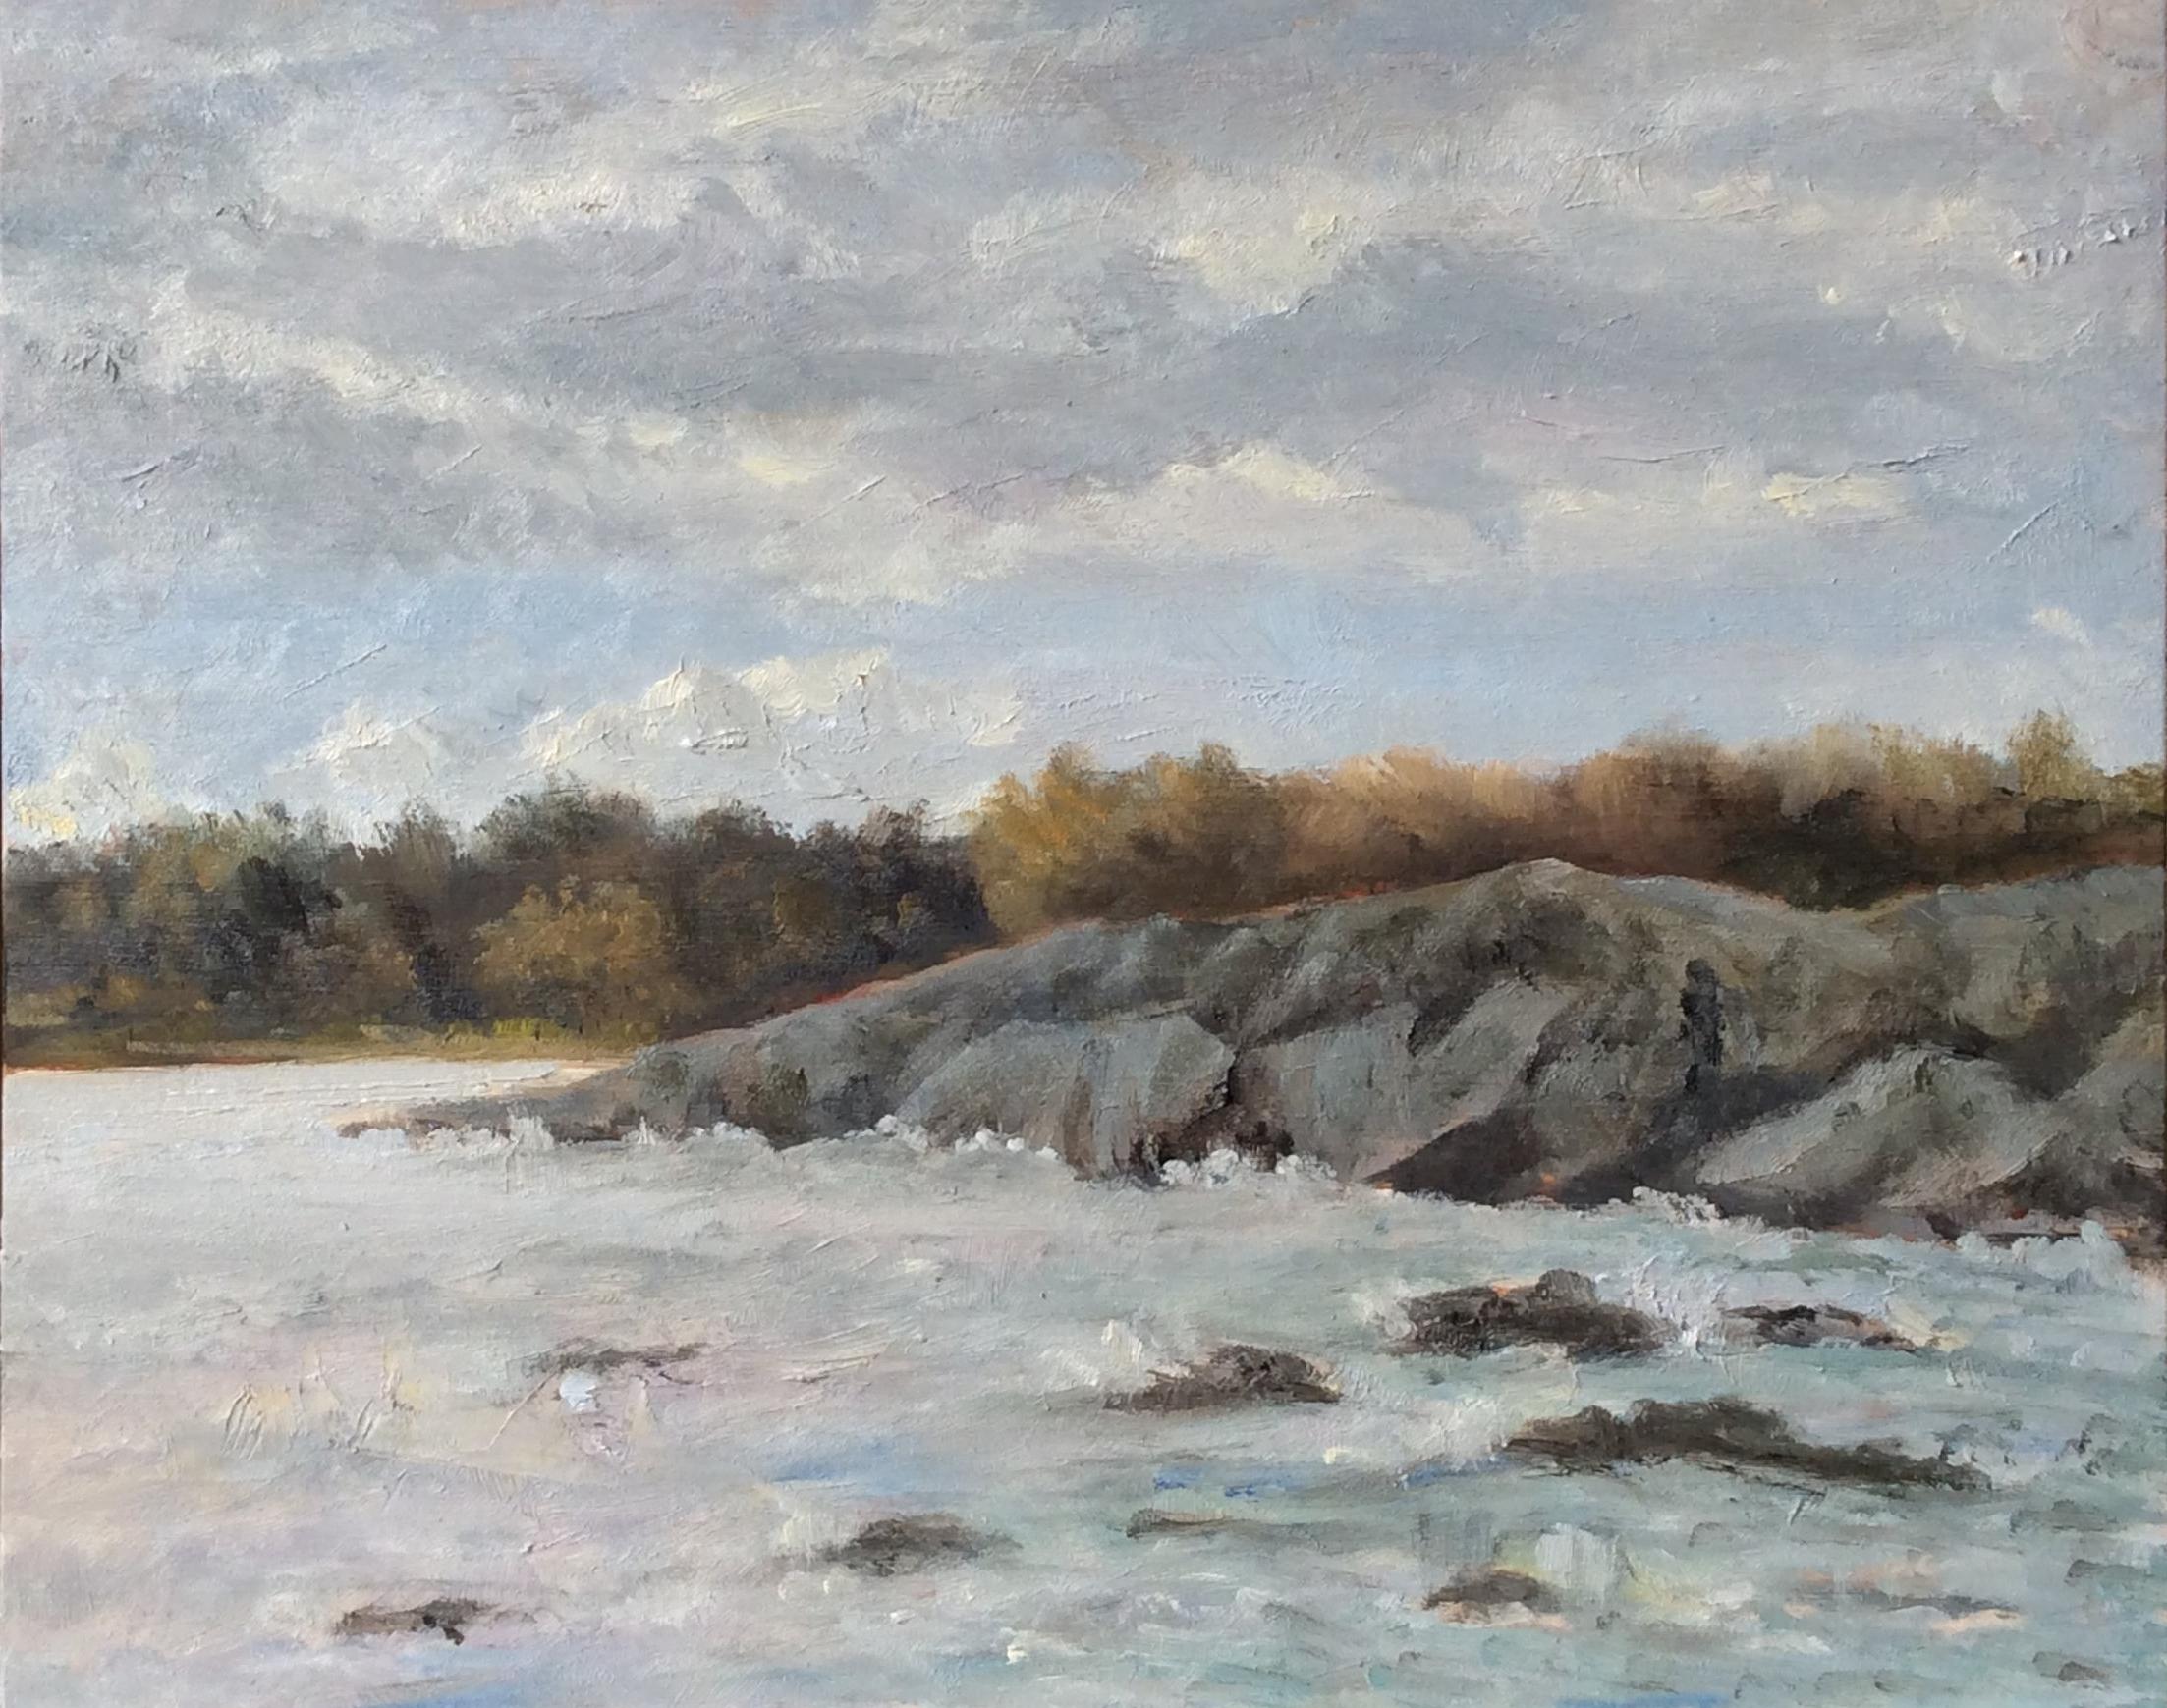 Rock, Sky and Sea   Oil 8 x 10